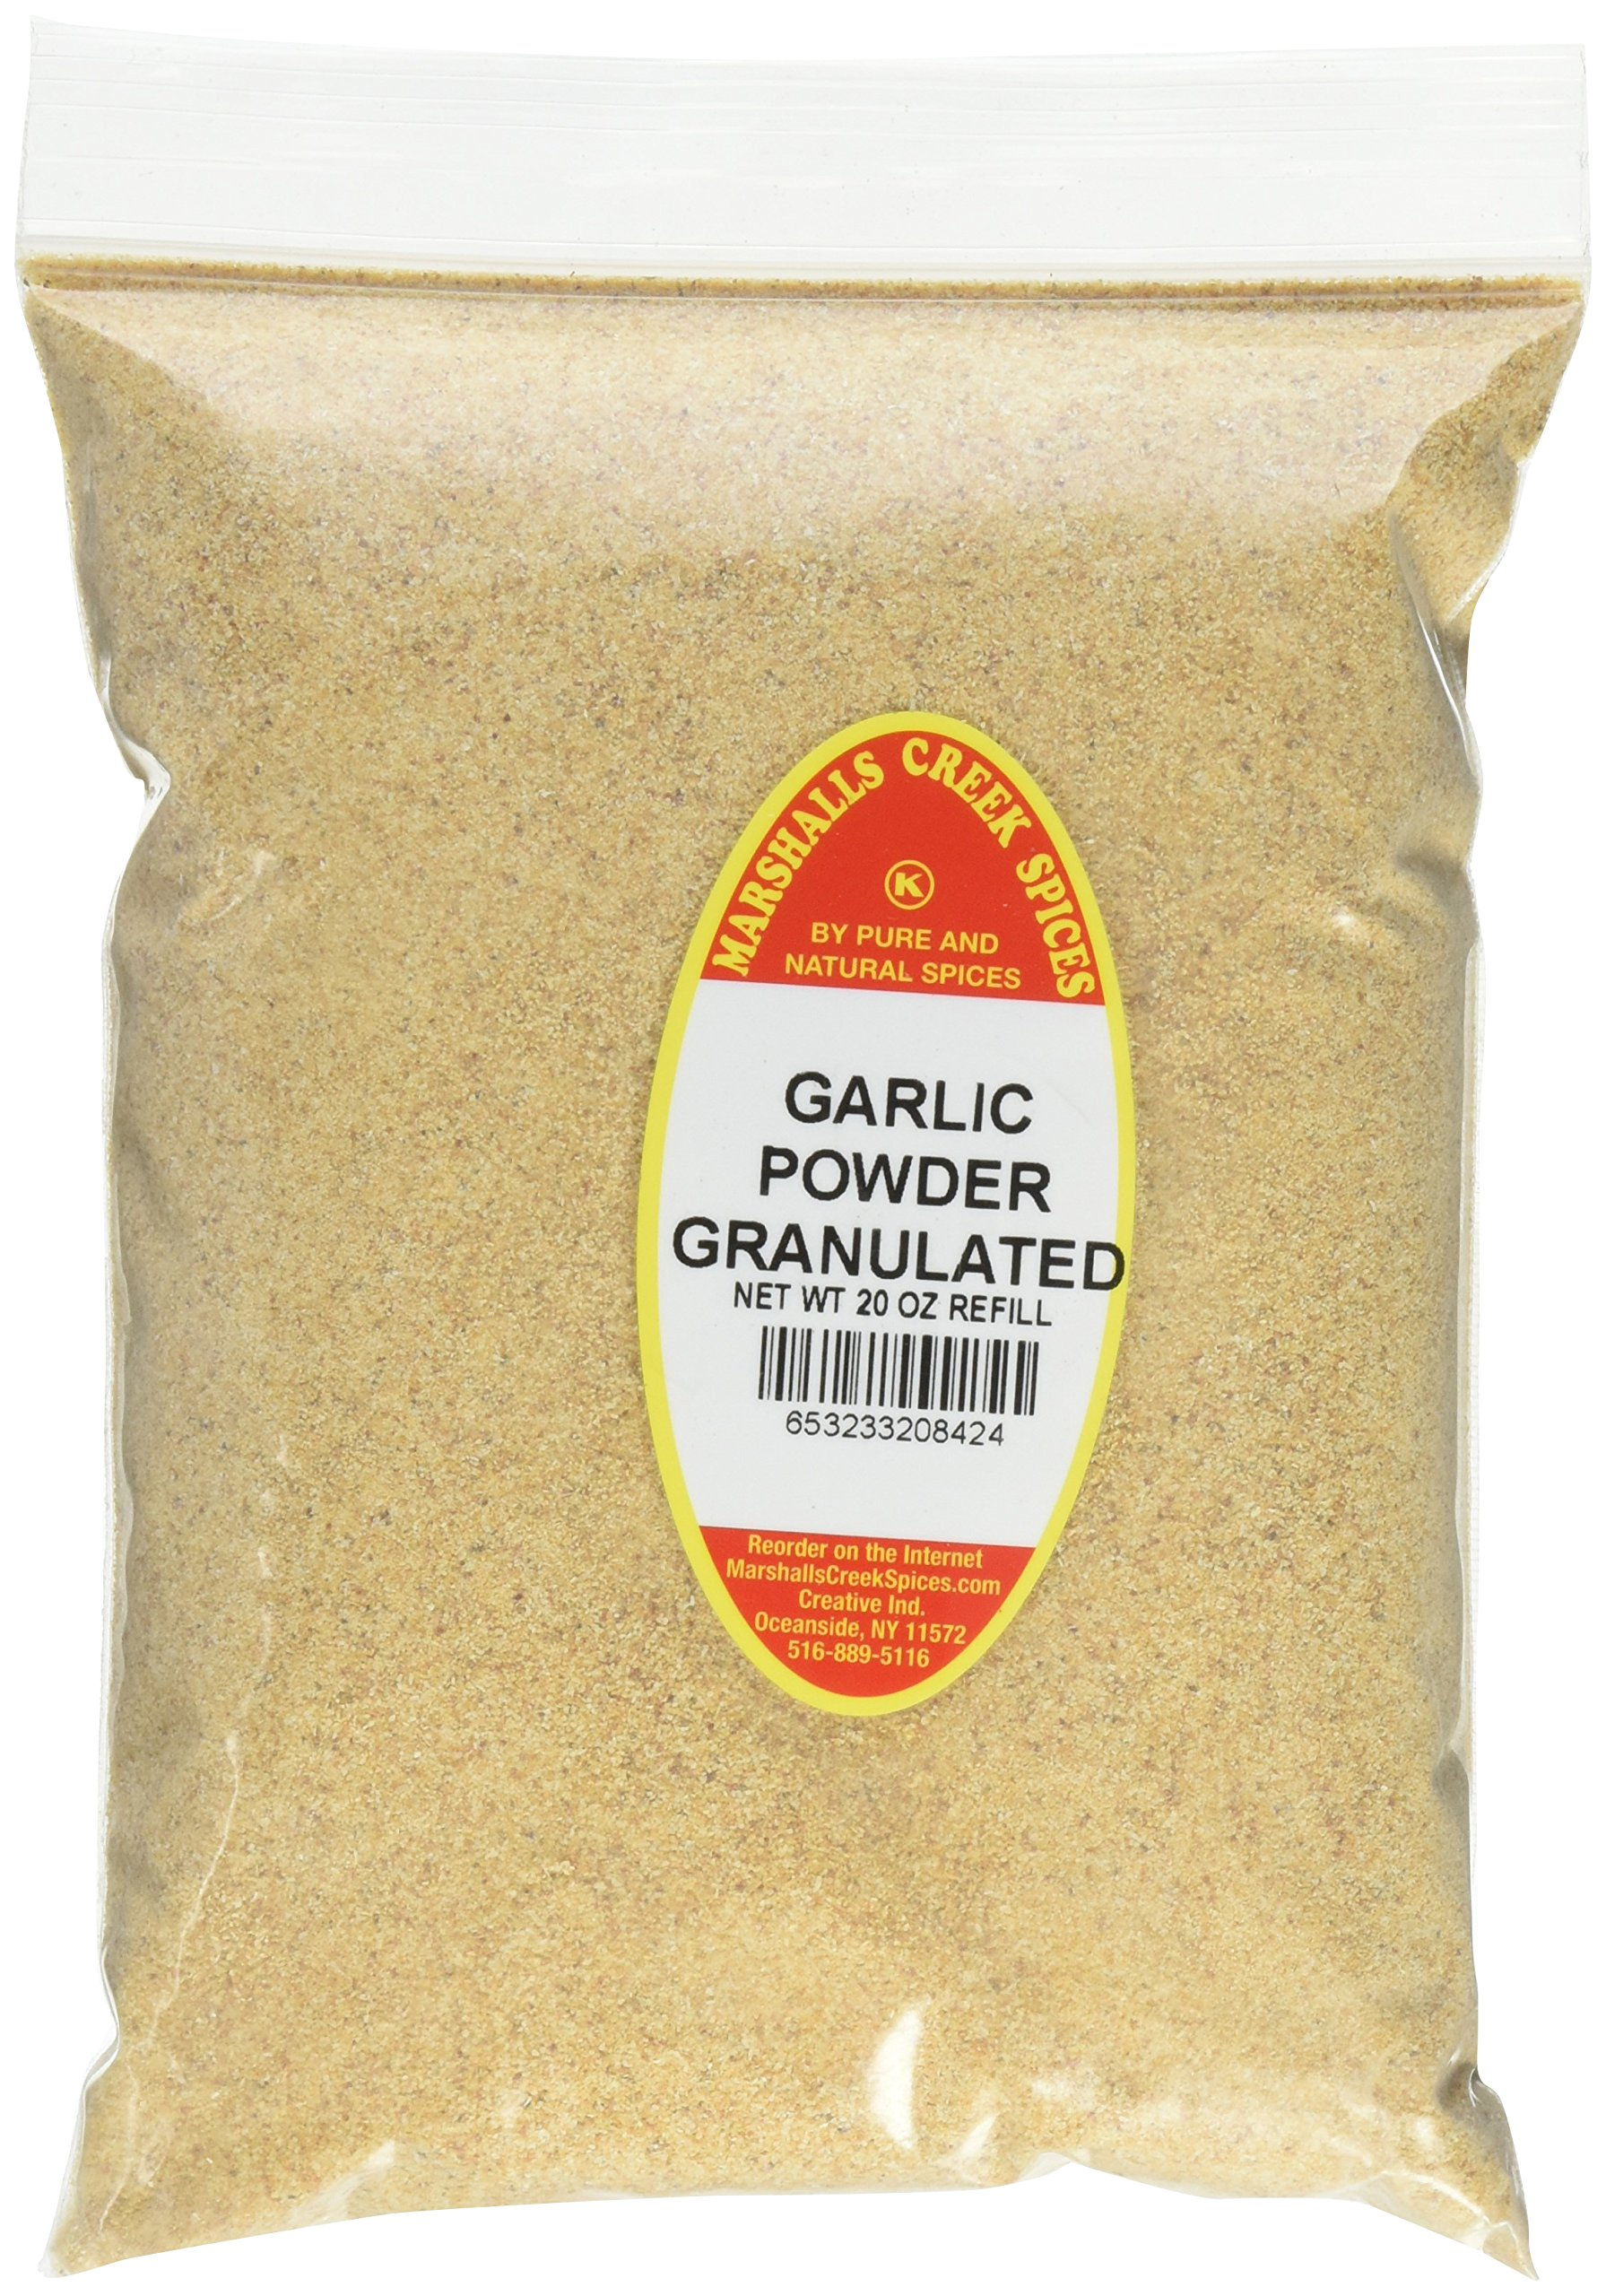 Marshalls Creek Spices Kosher Granulated Garlic Powder Refill, 20 Ounce